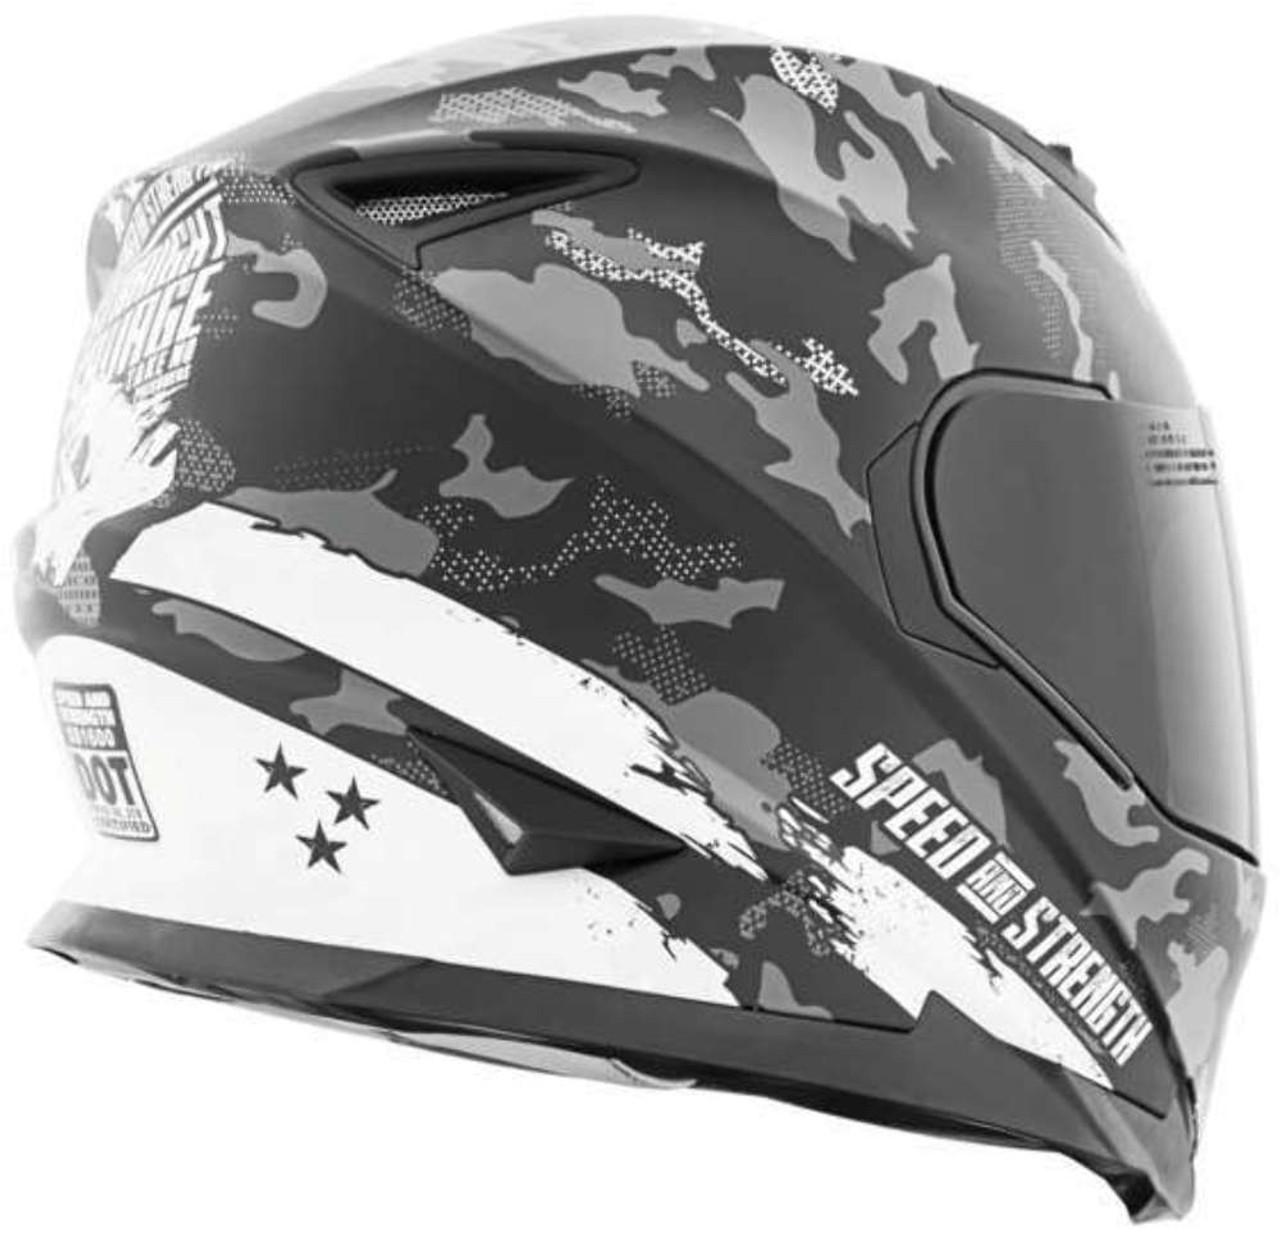 LARGE Sure Shot BLUE//BLACK Speed /& Strength SS1600 Helmet